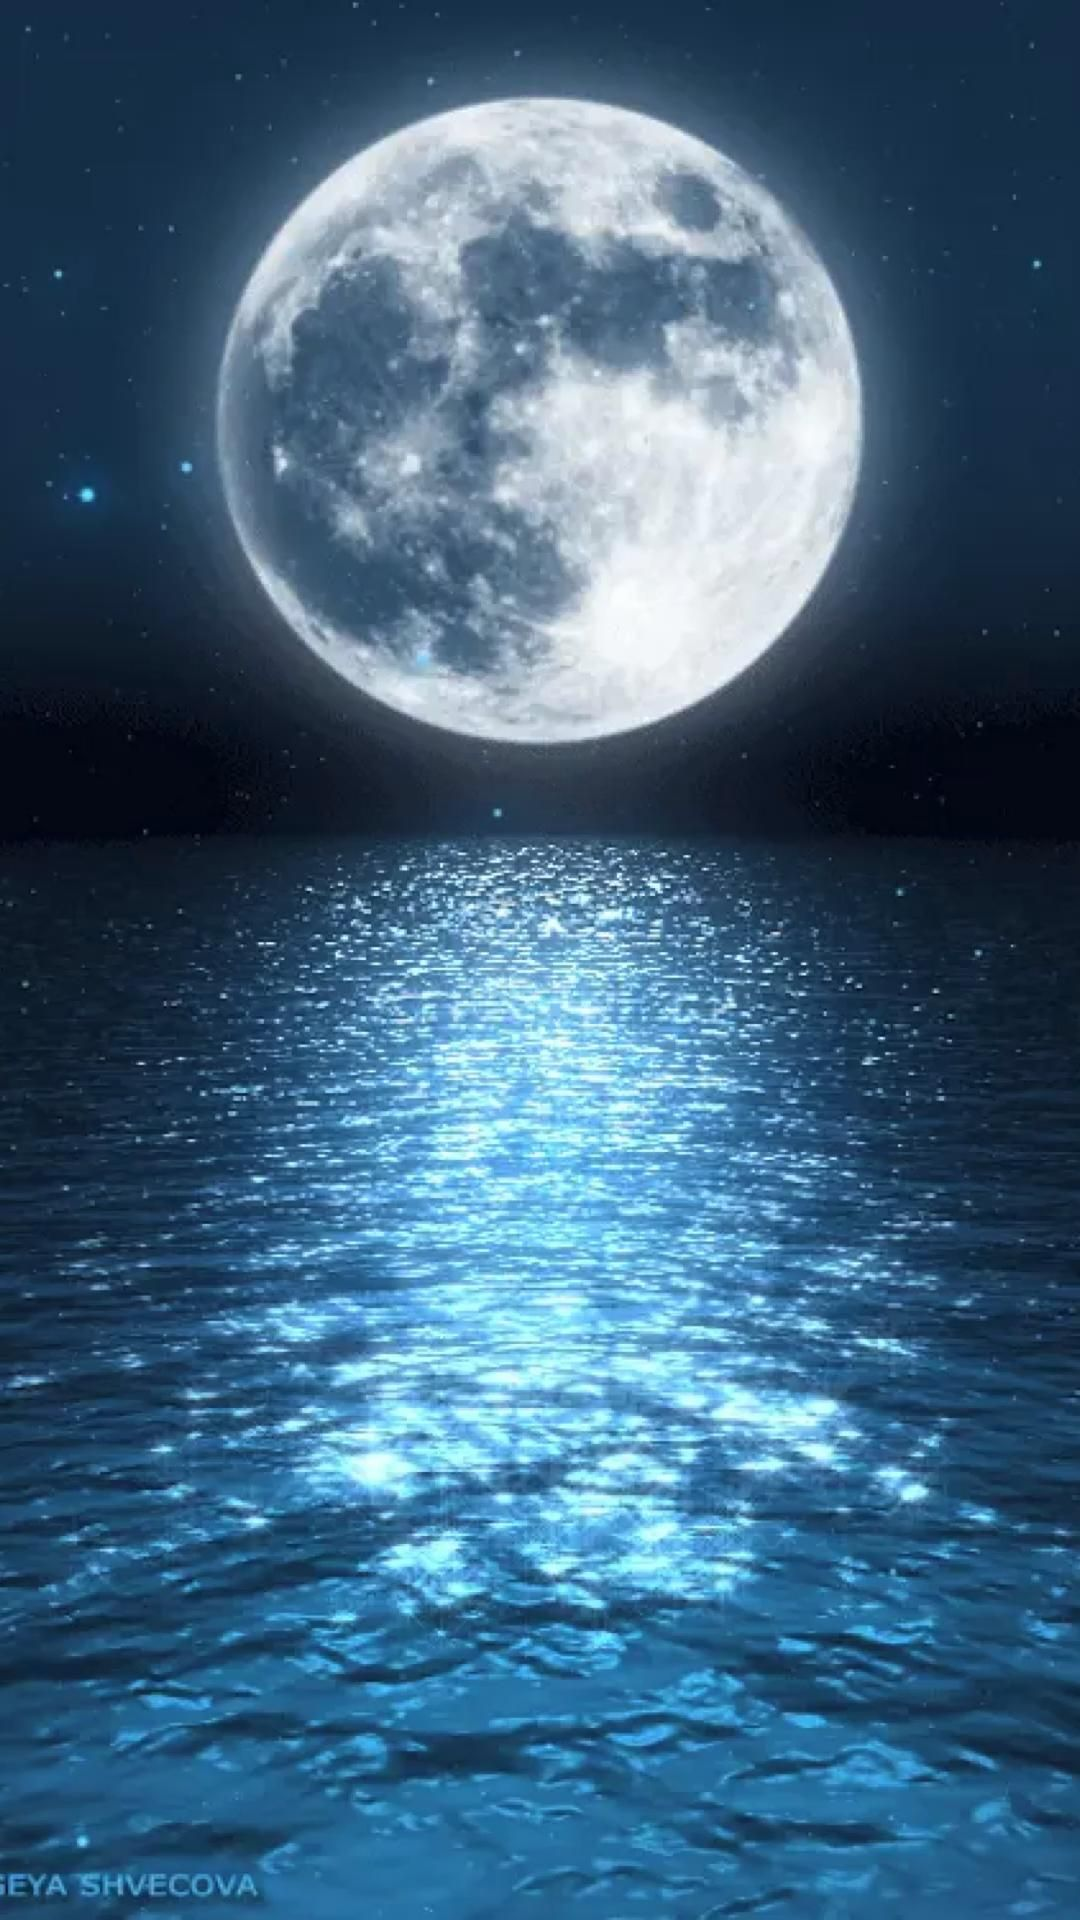 Sweet Dreams 🌙⭐️